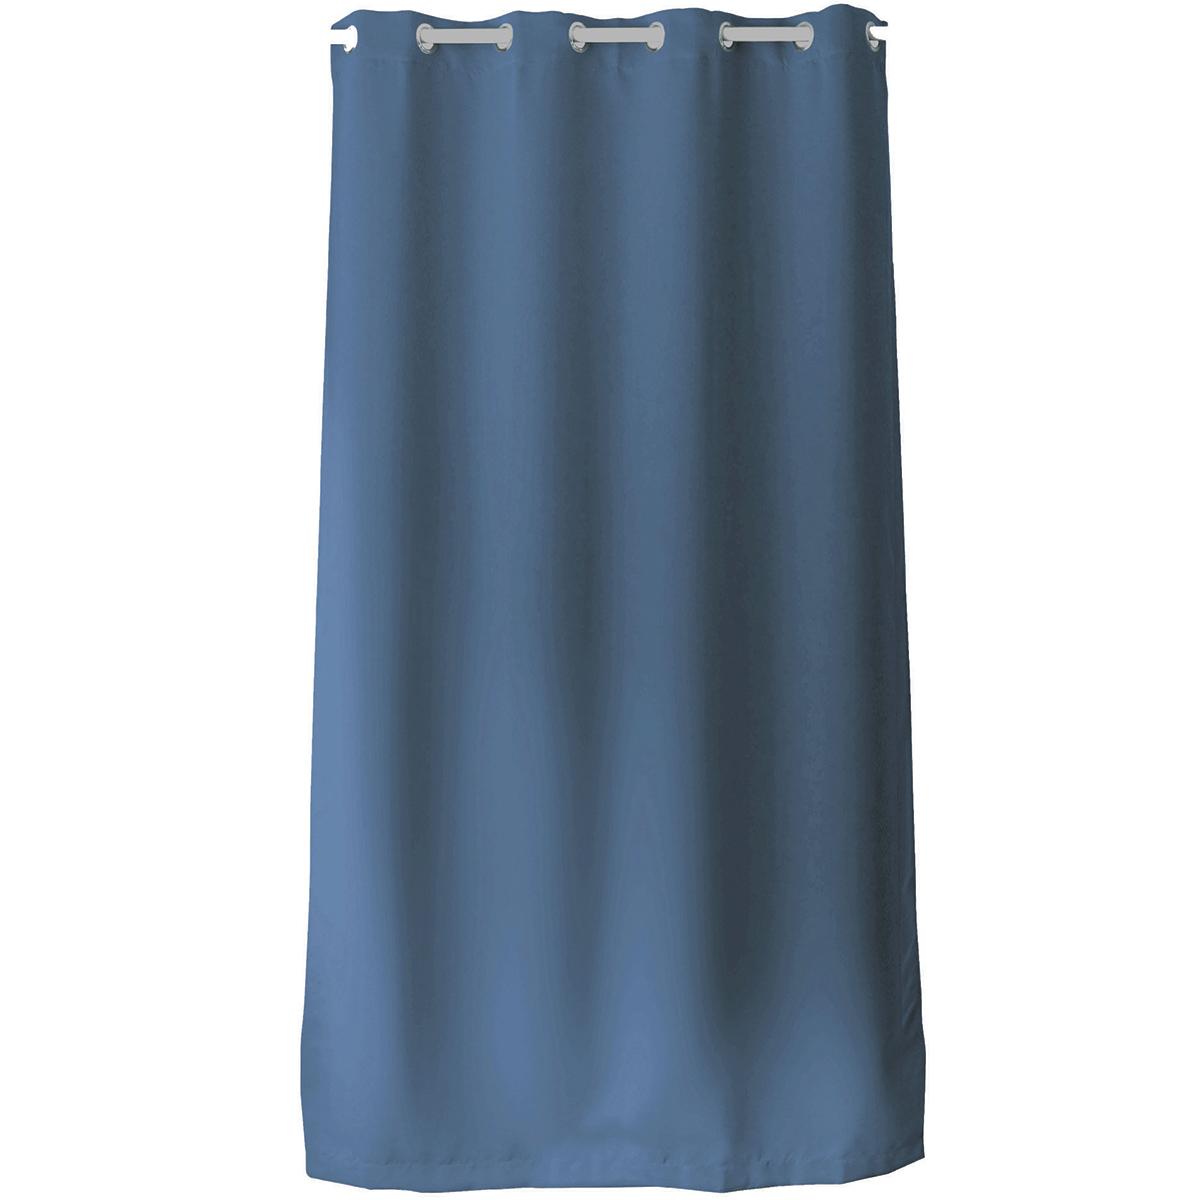 rideau bleu 240